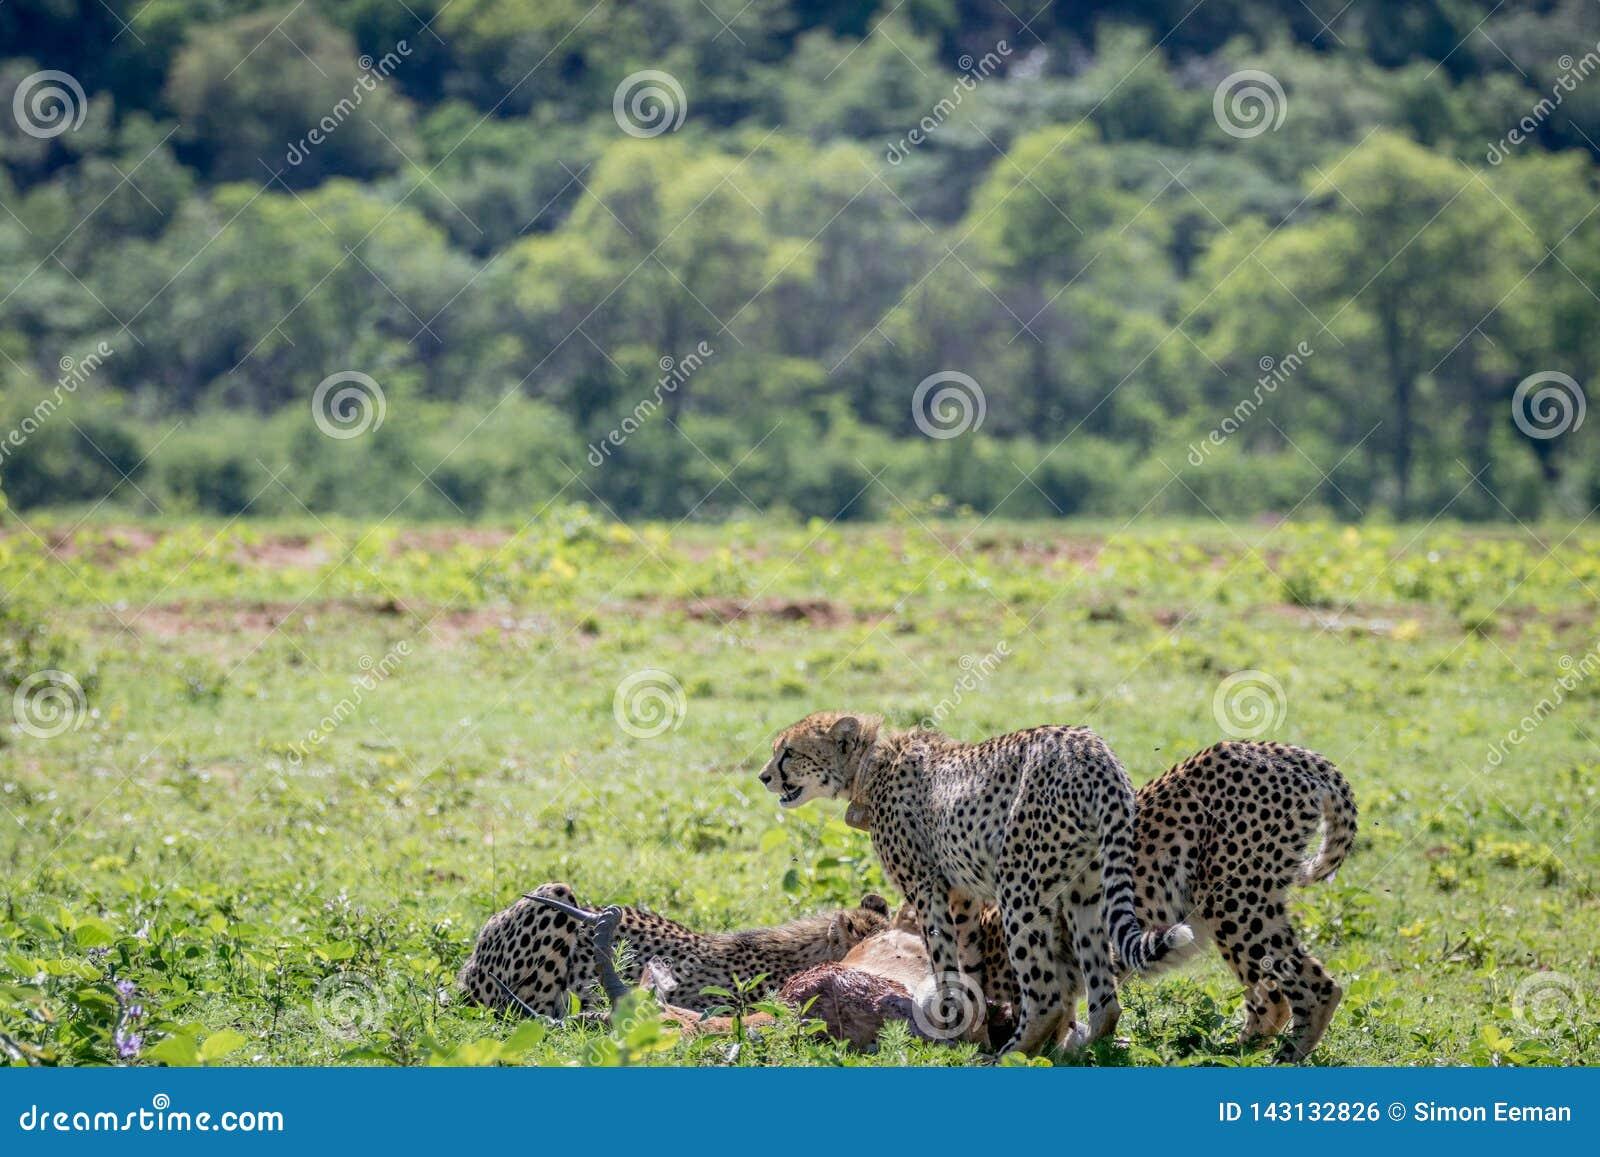 Cheetahs feeding on a male Impala kill